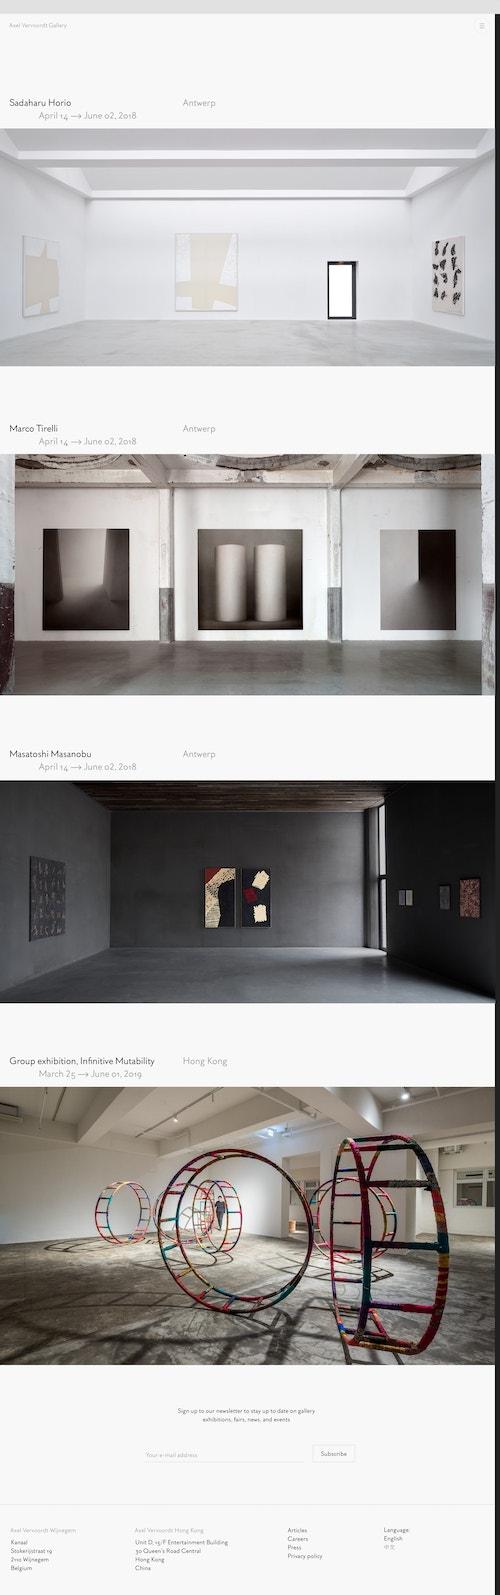 Screenshot of the homepage of the Axel Vervoordt Gallery website